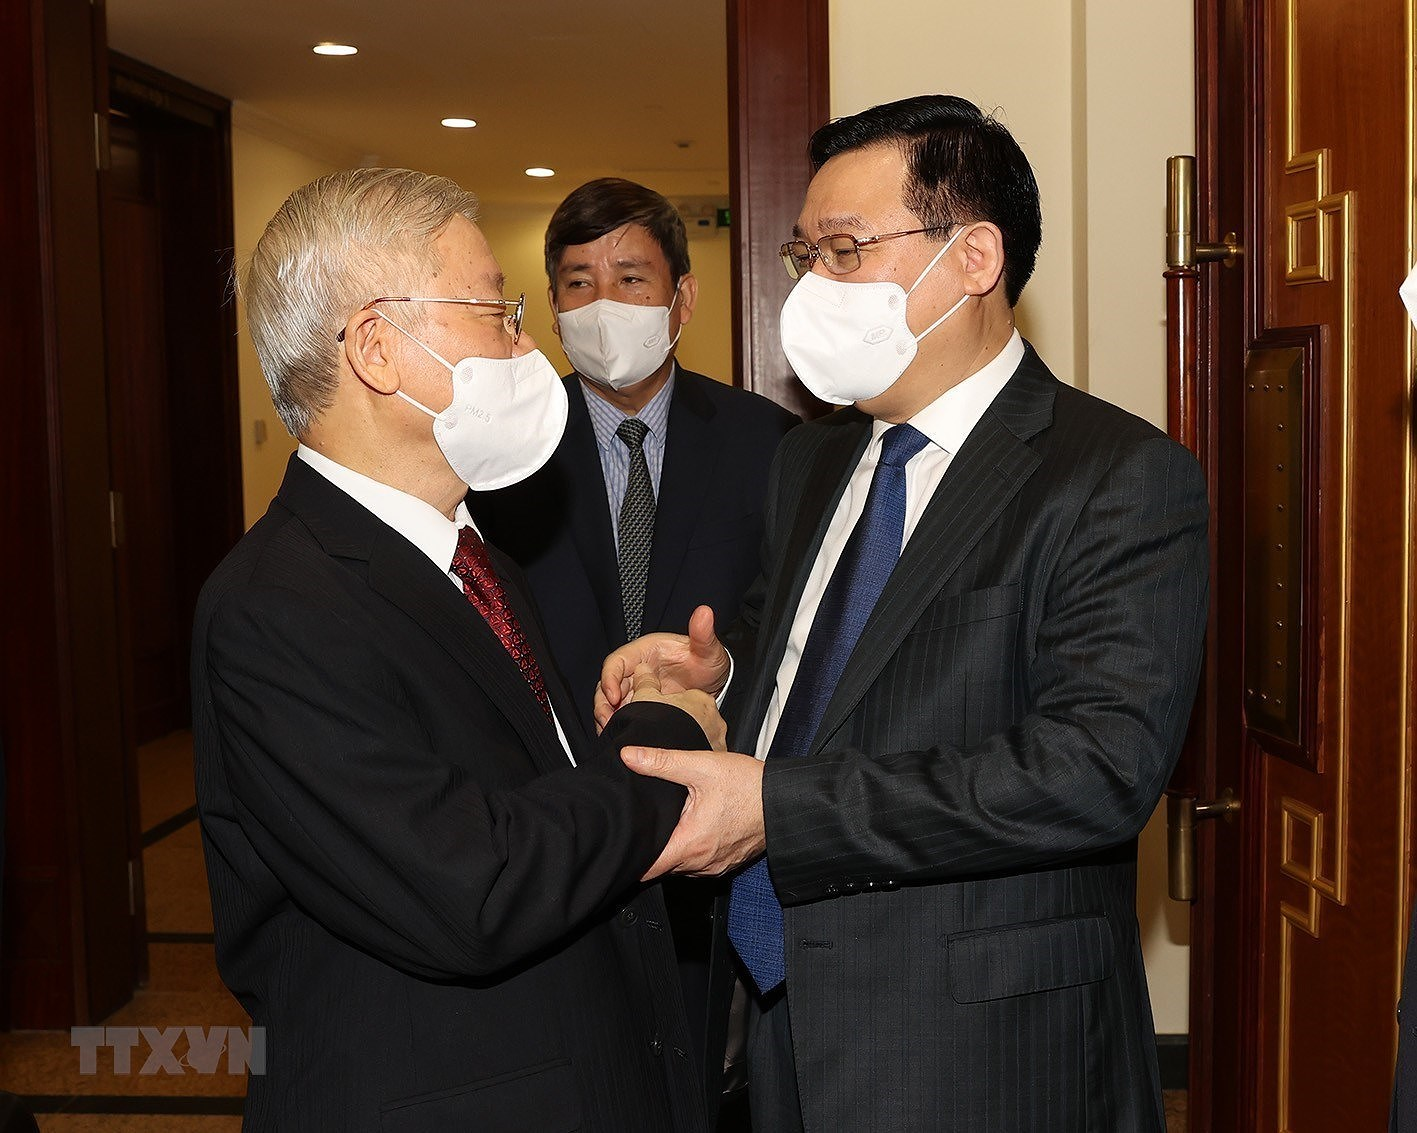 [Photo] Hoi nghi lan thu tu Ban Chap hanh Trung uong Dang khoa XIII hinh anh 6